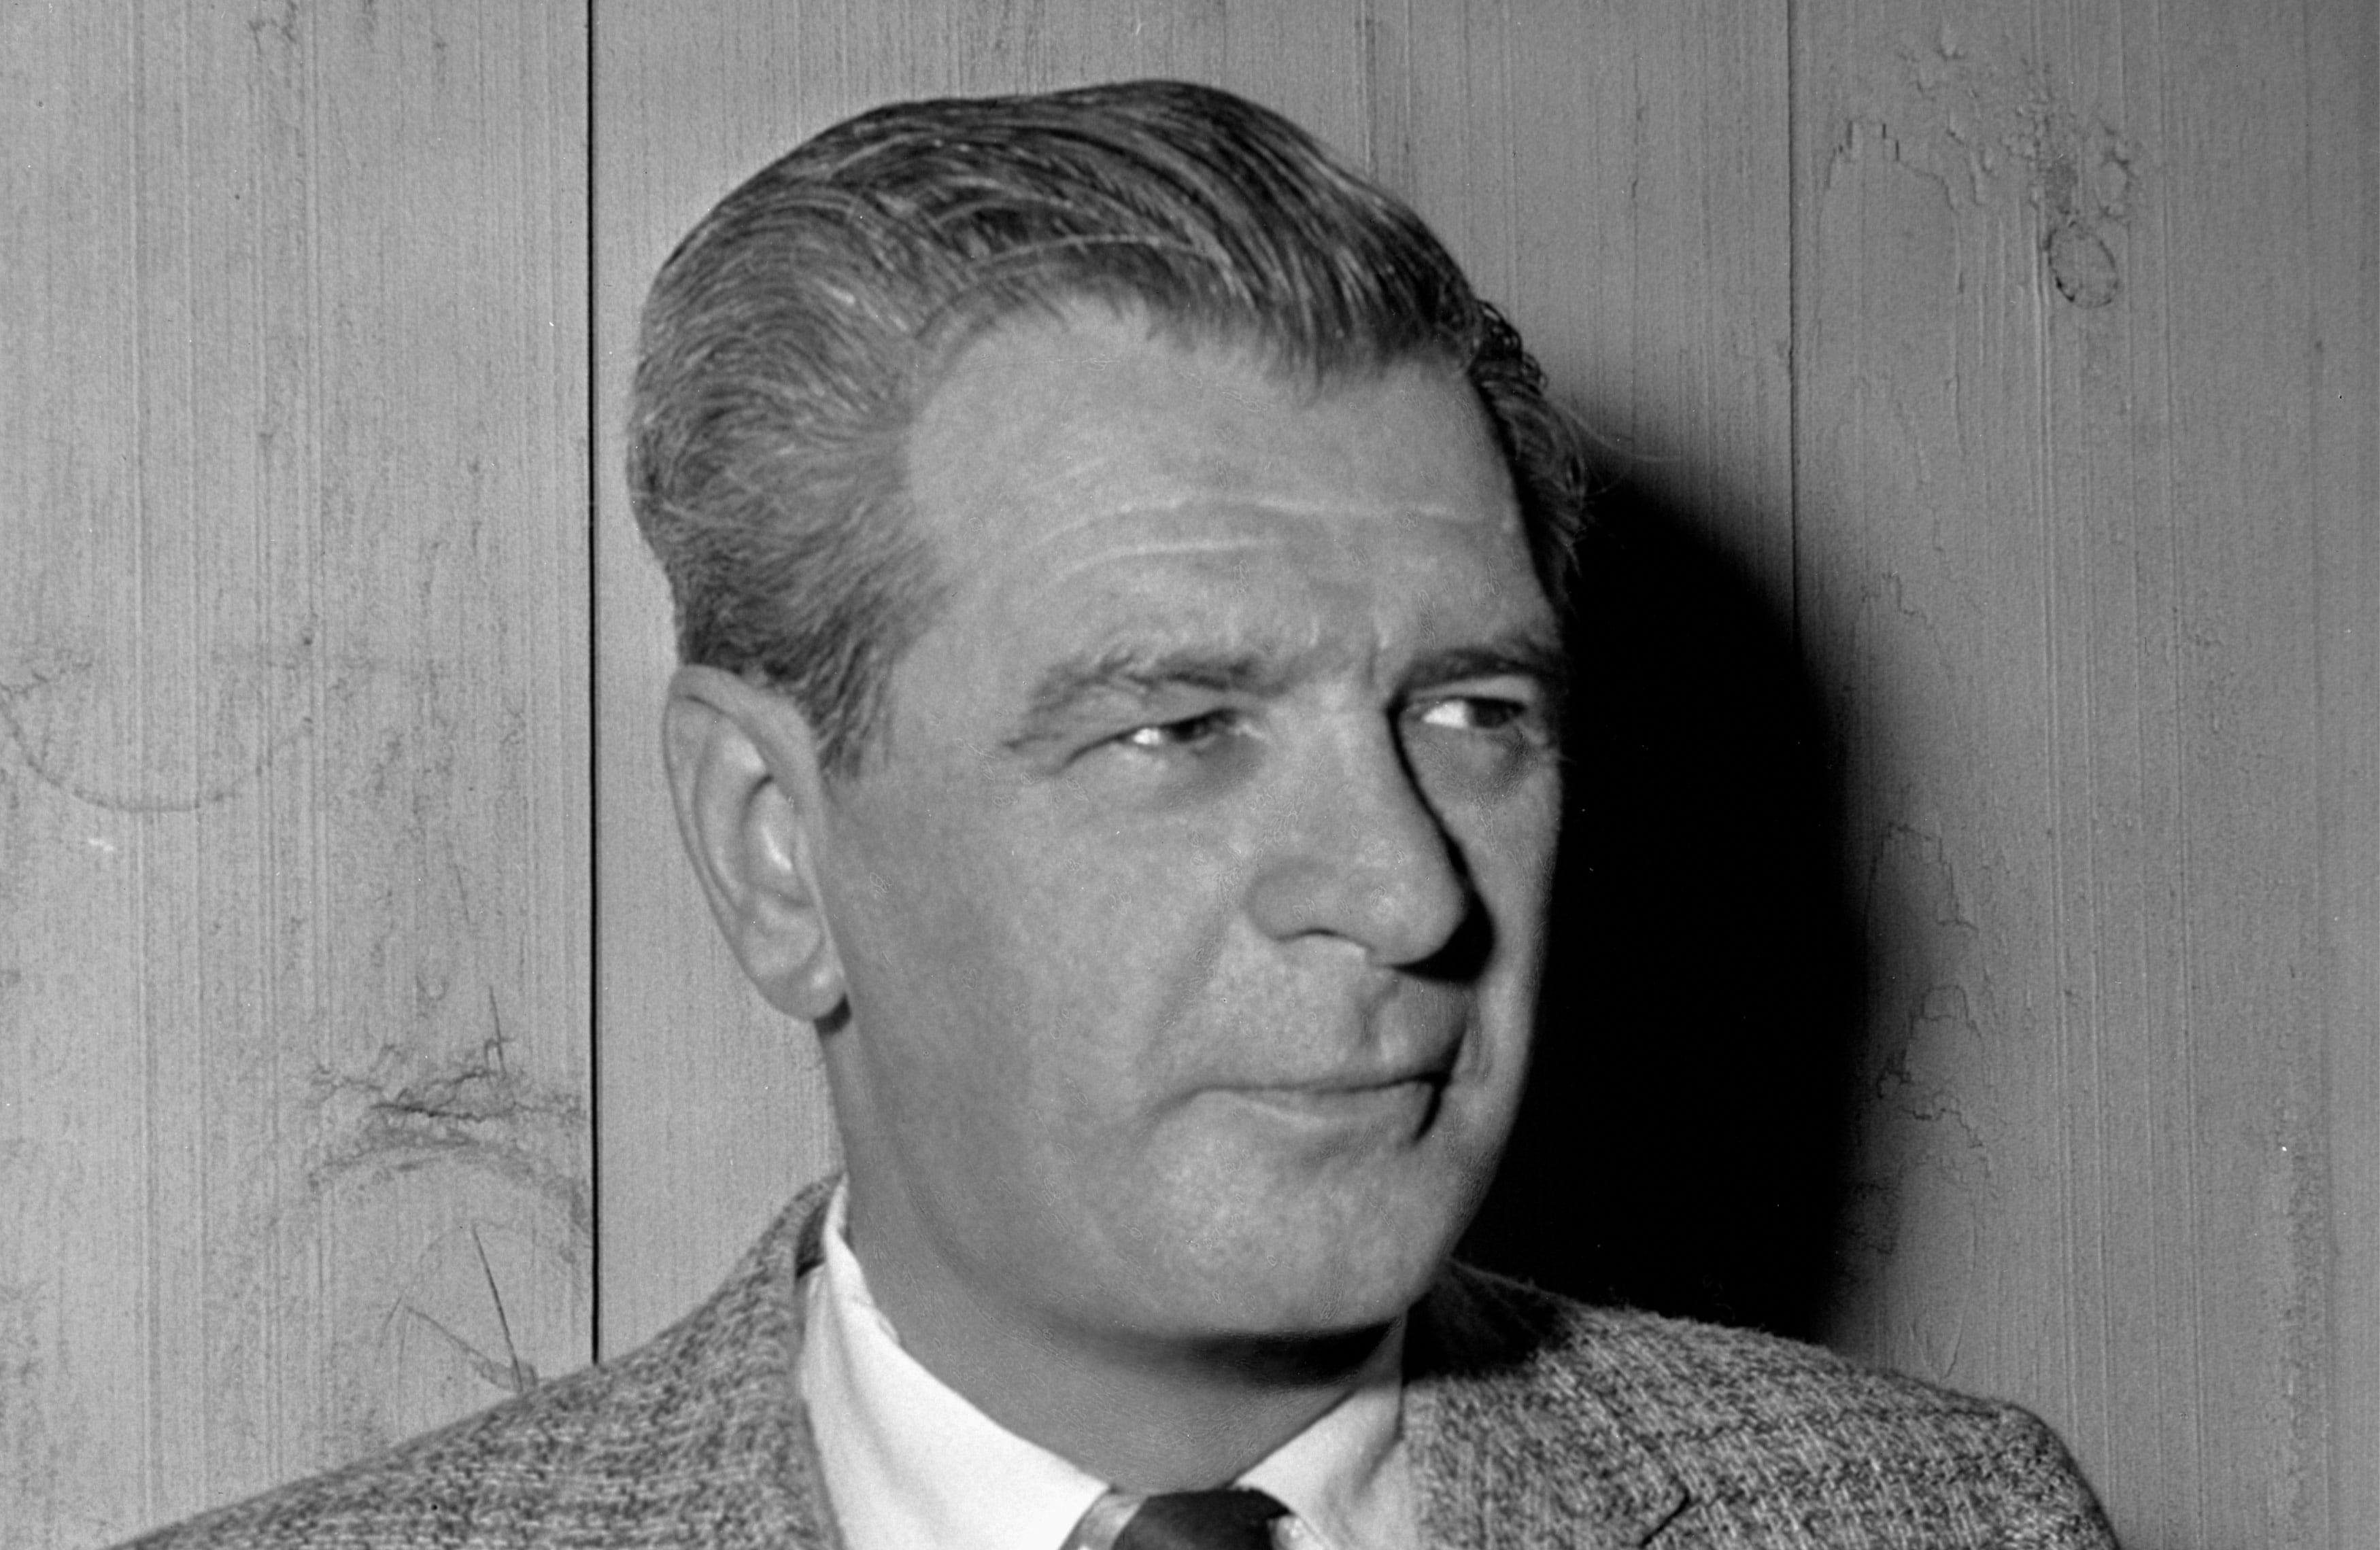 Robert B. Sinclair